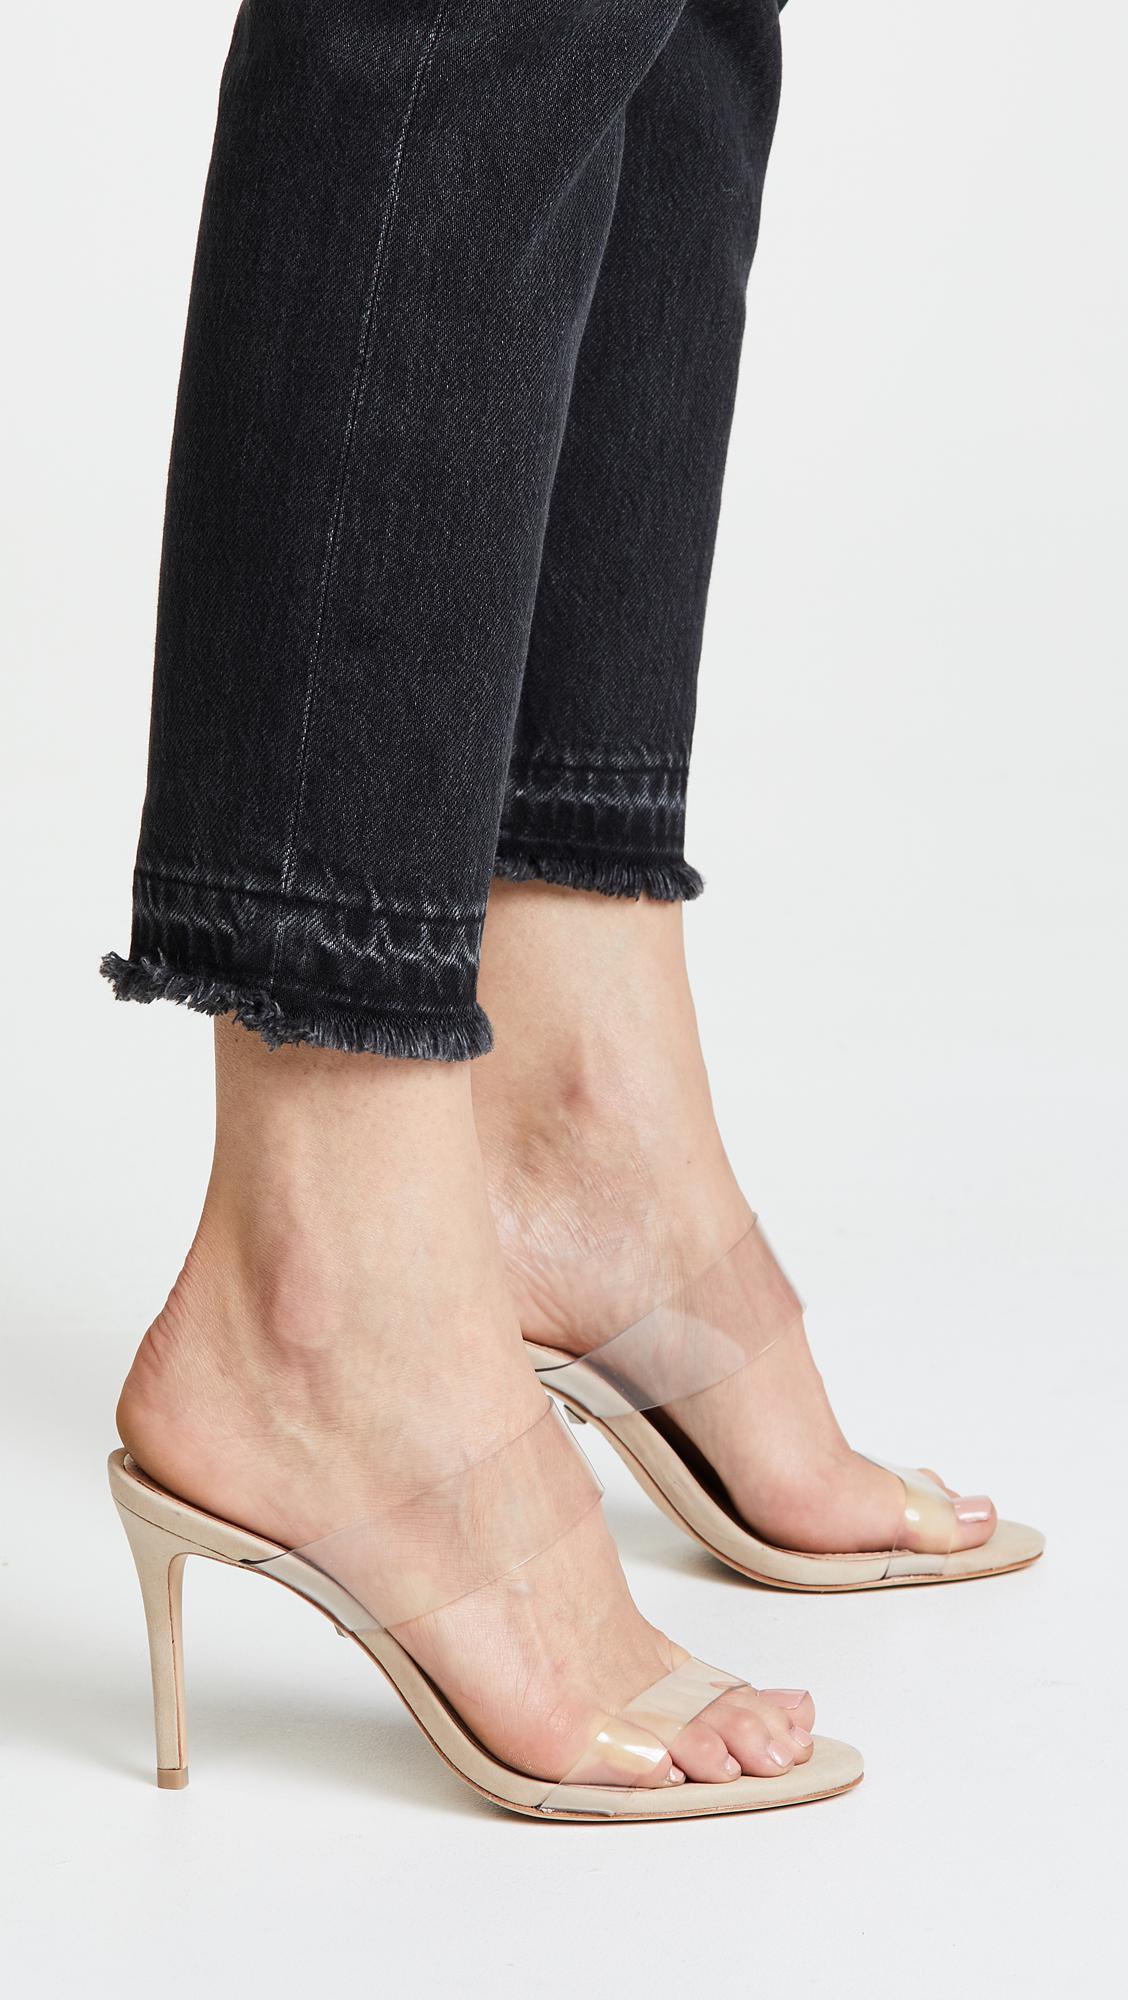 de19ec9772 Schutz Ariella Strappy Sandals - Lyst